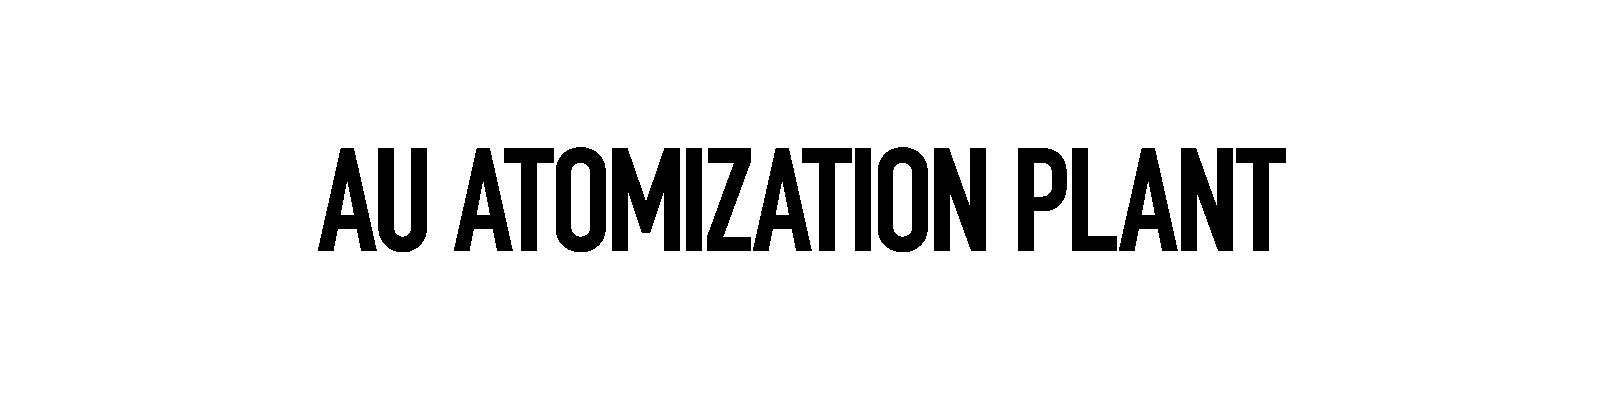 AU Atomization Plant